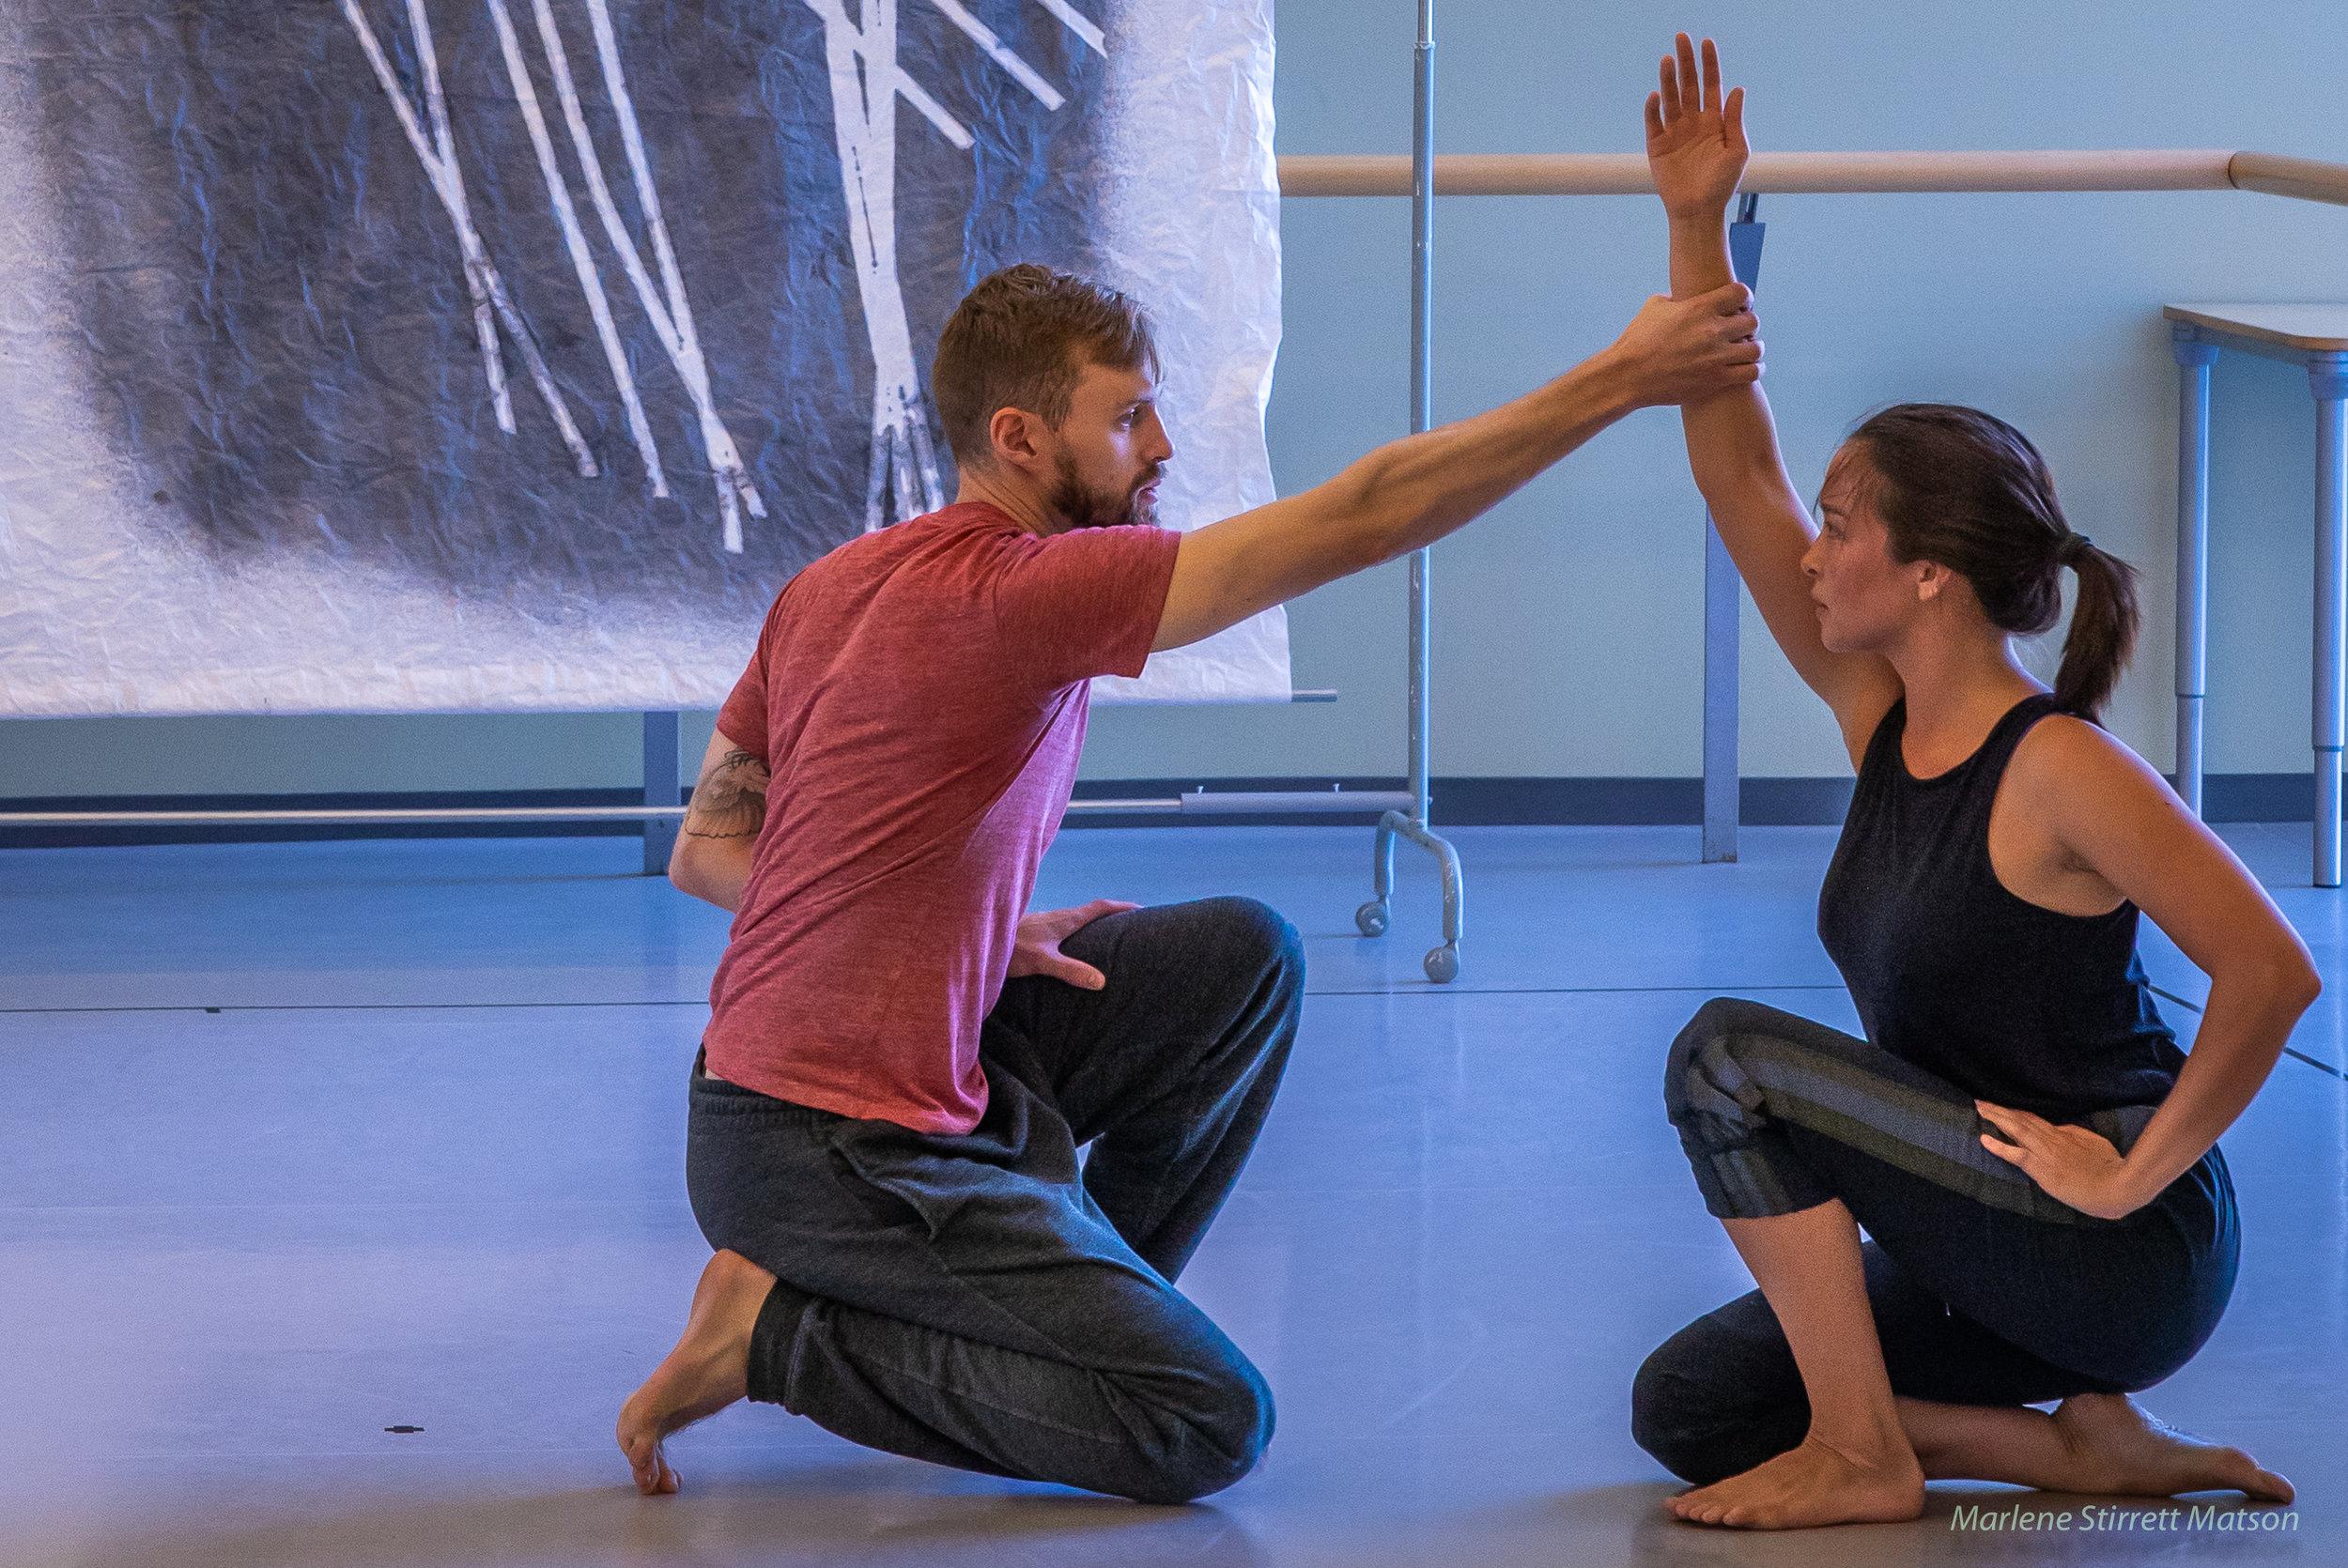 Jarrett and Sierra rehearsing at Canada's national ballet school